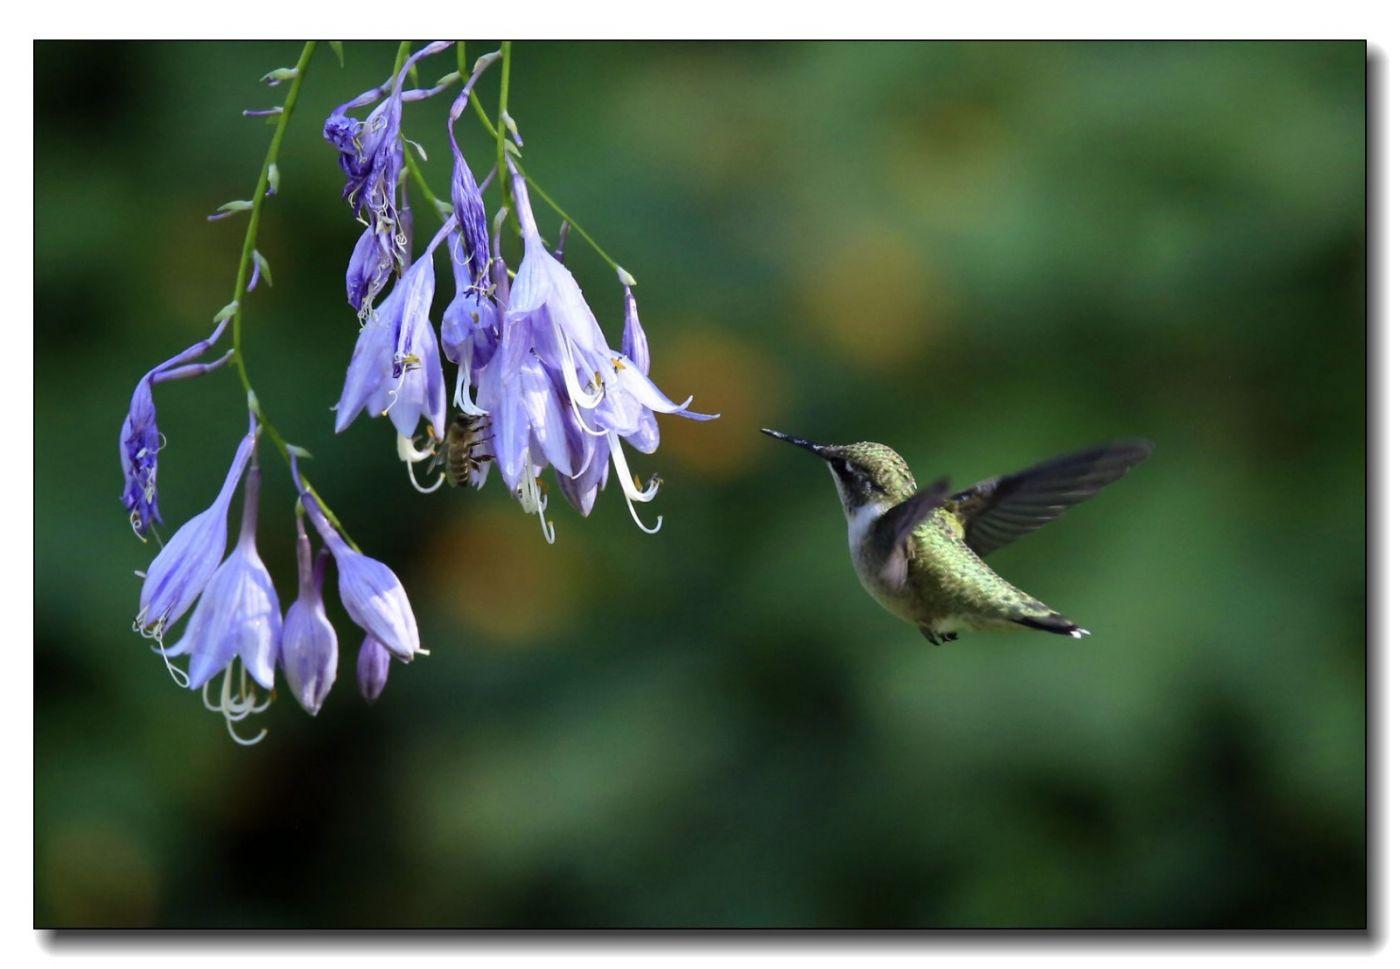 蜂鸟组图(六)_图1-4